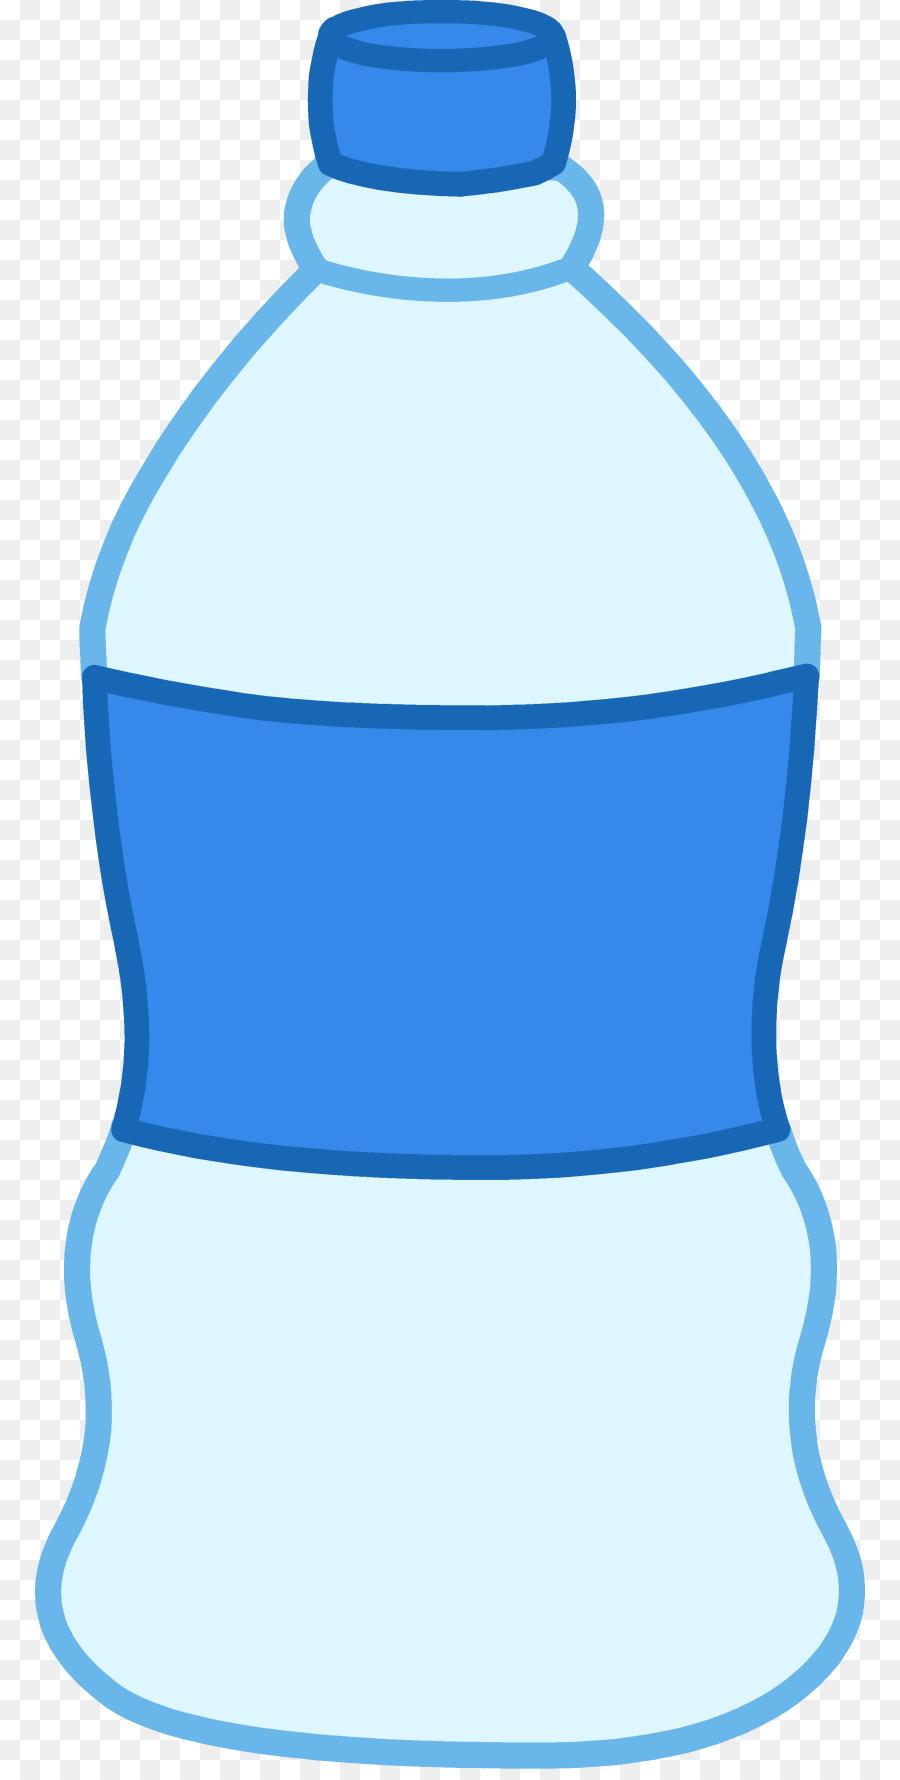 water bottles bottled water clip art water cave cliparts png rh kisspng com Water Bottle Labels bottled water clipart images